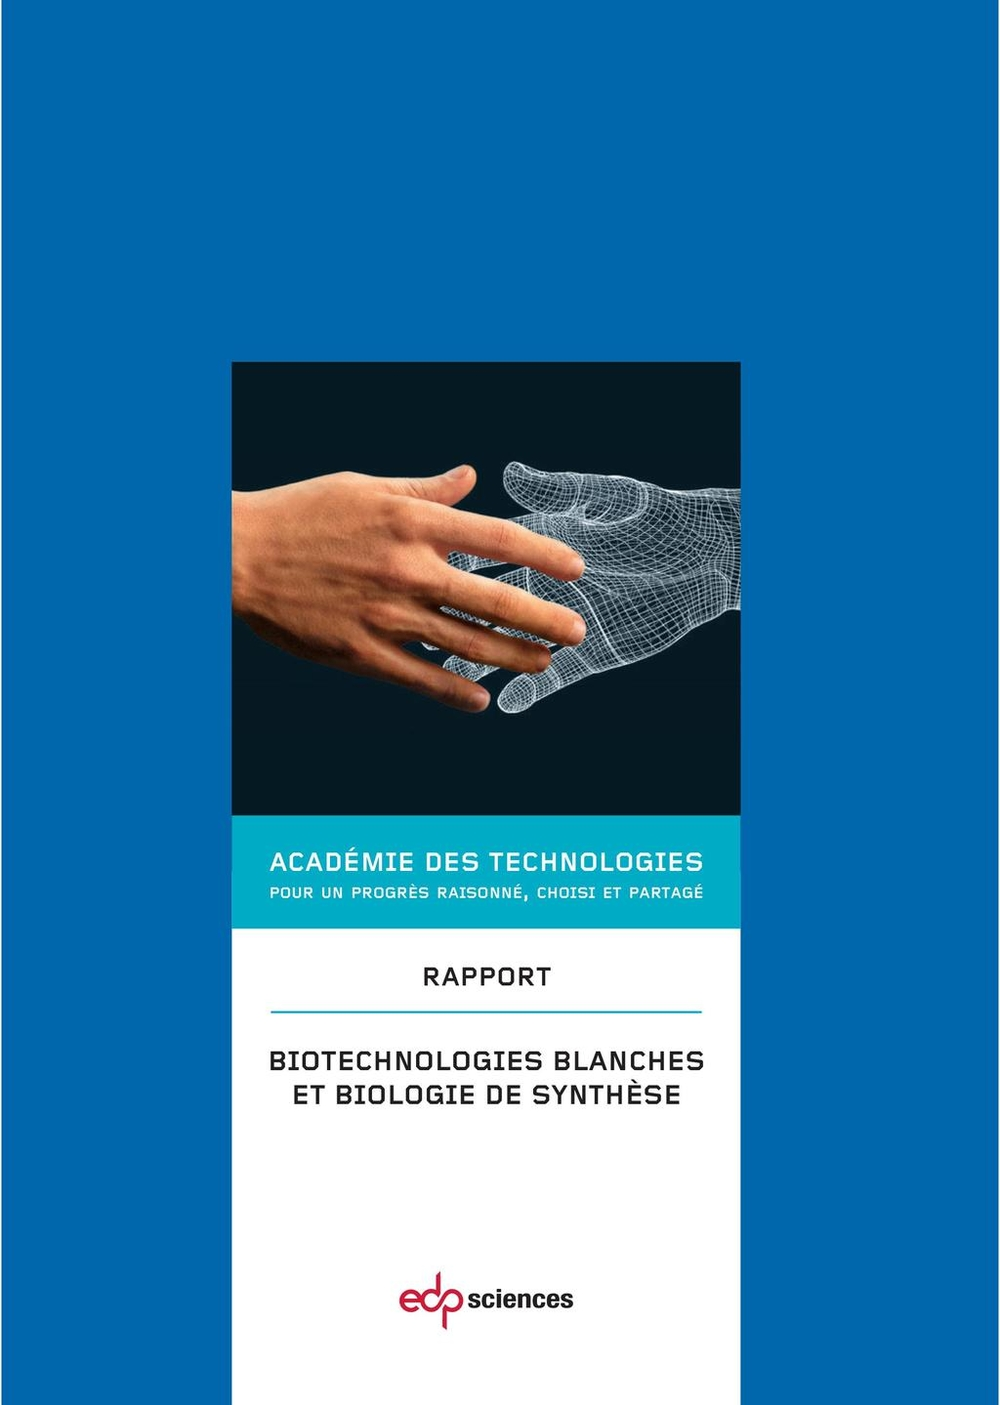 Biotechnologies blanches et biologie de synthèse